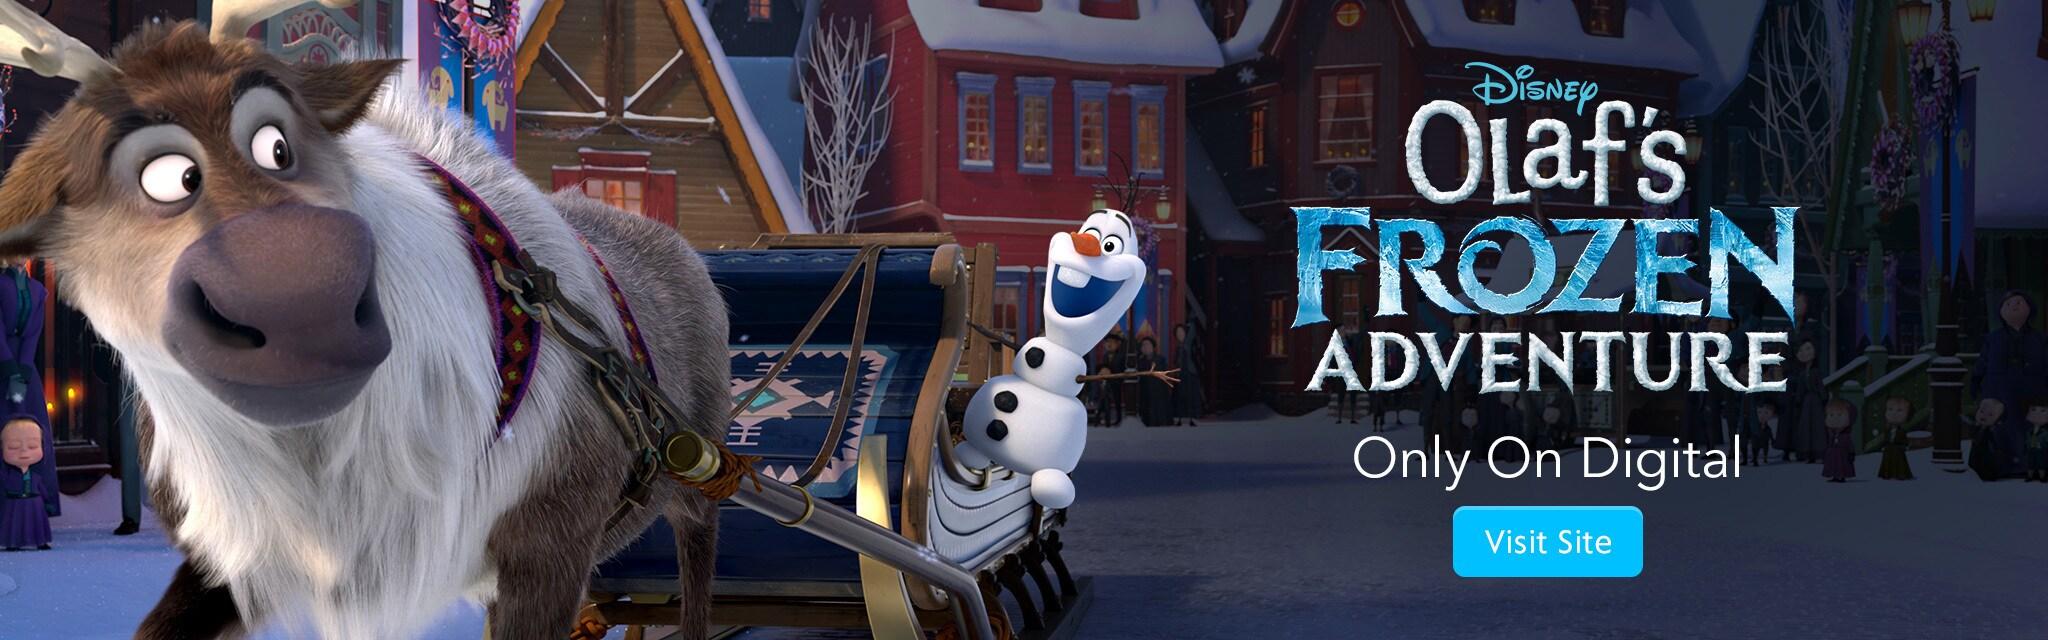 And Winter Anna Disney Frozen Elsa Store yb7gvYf6